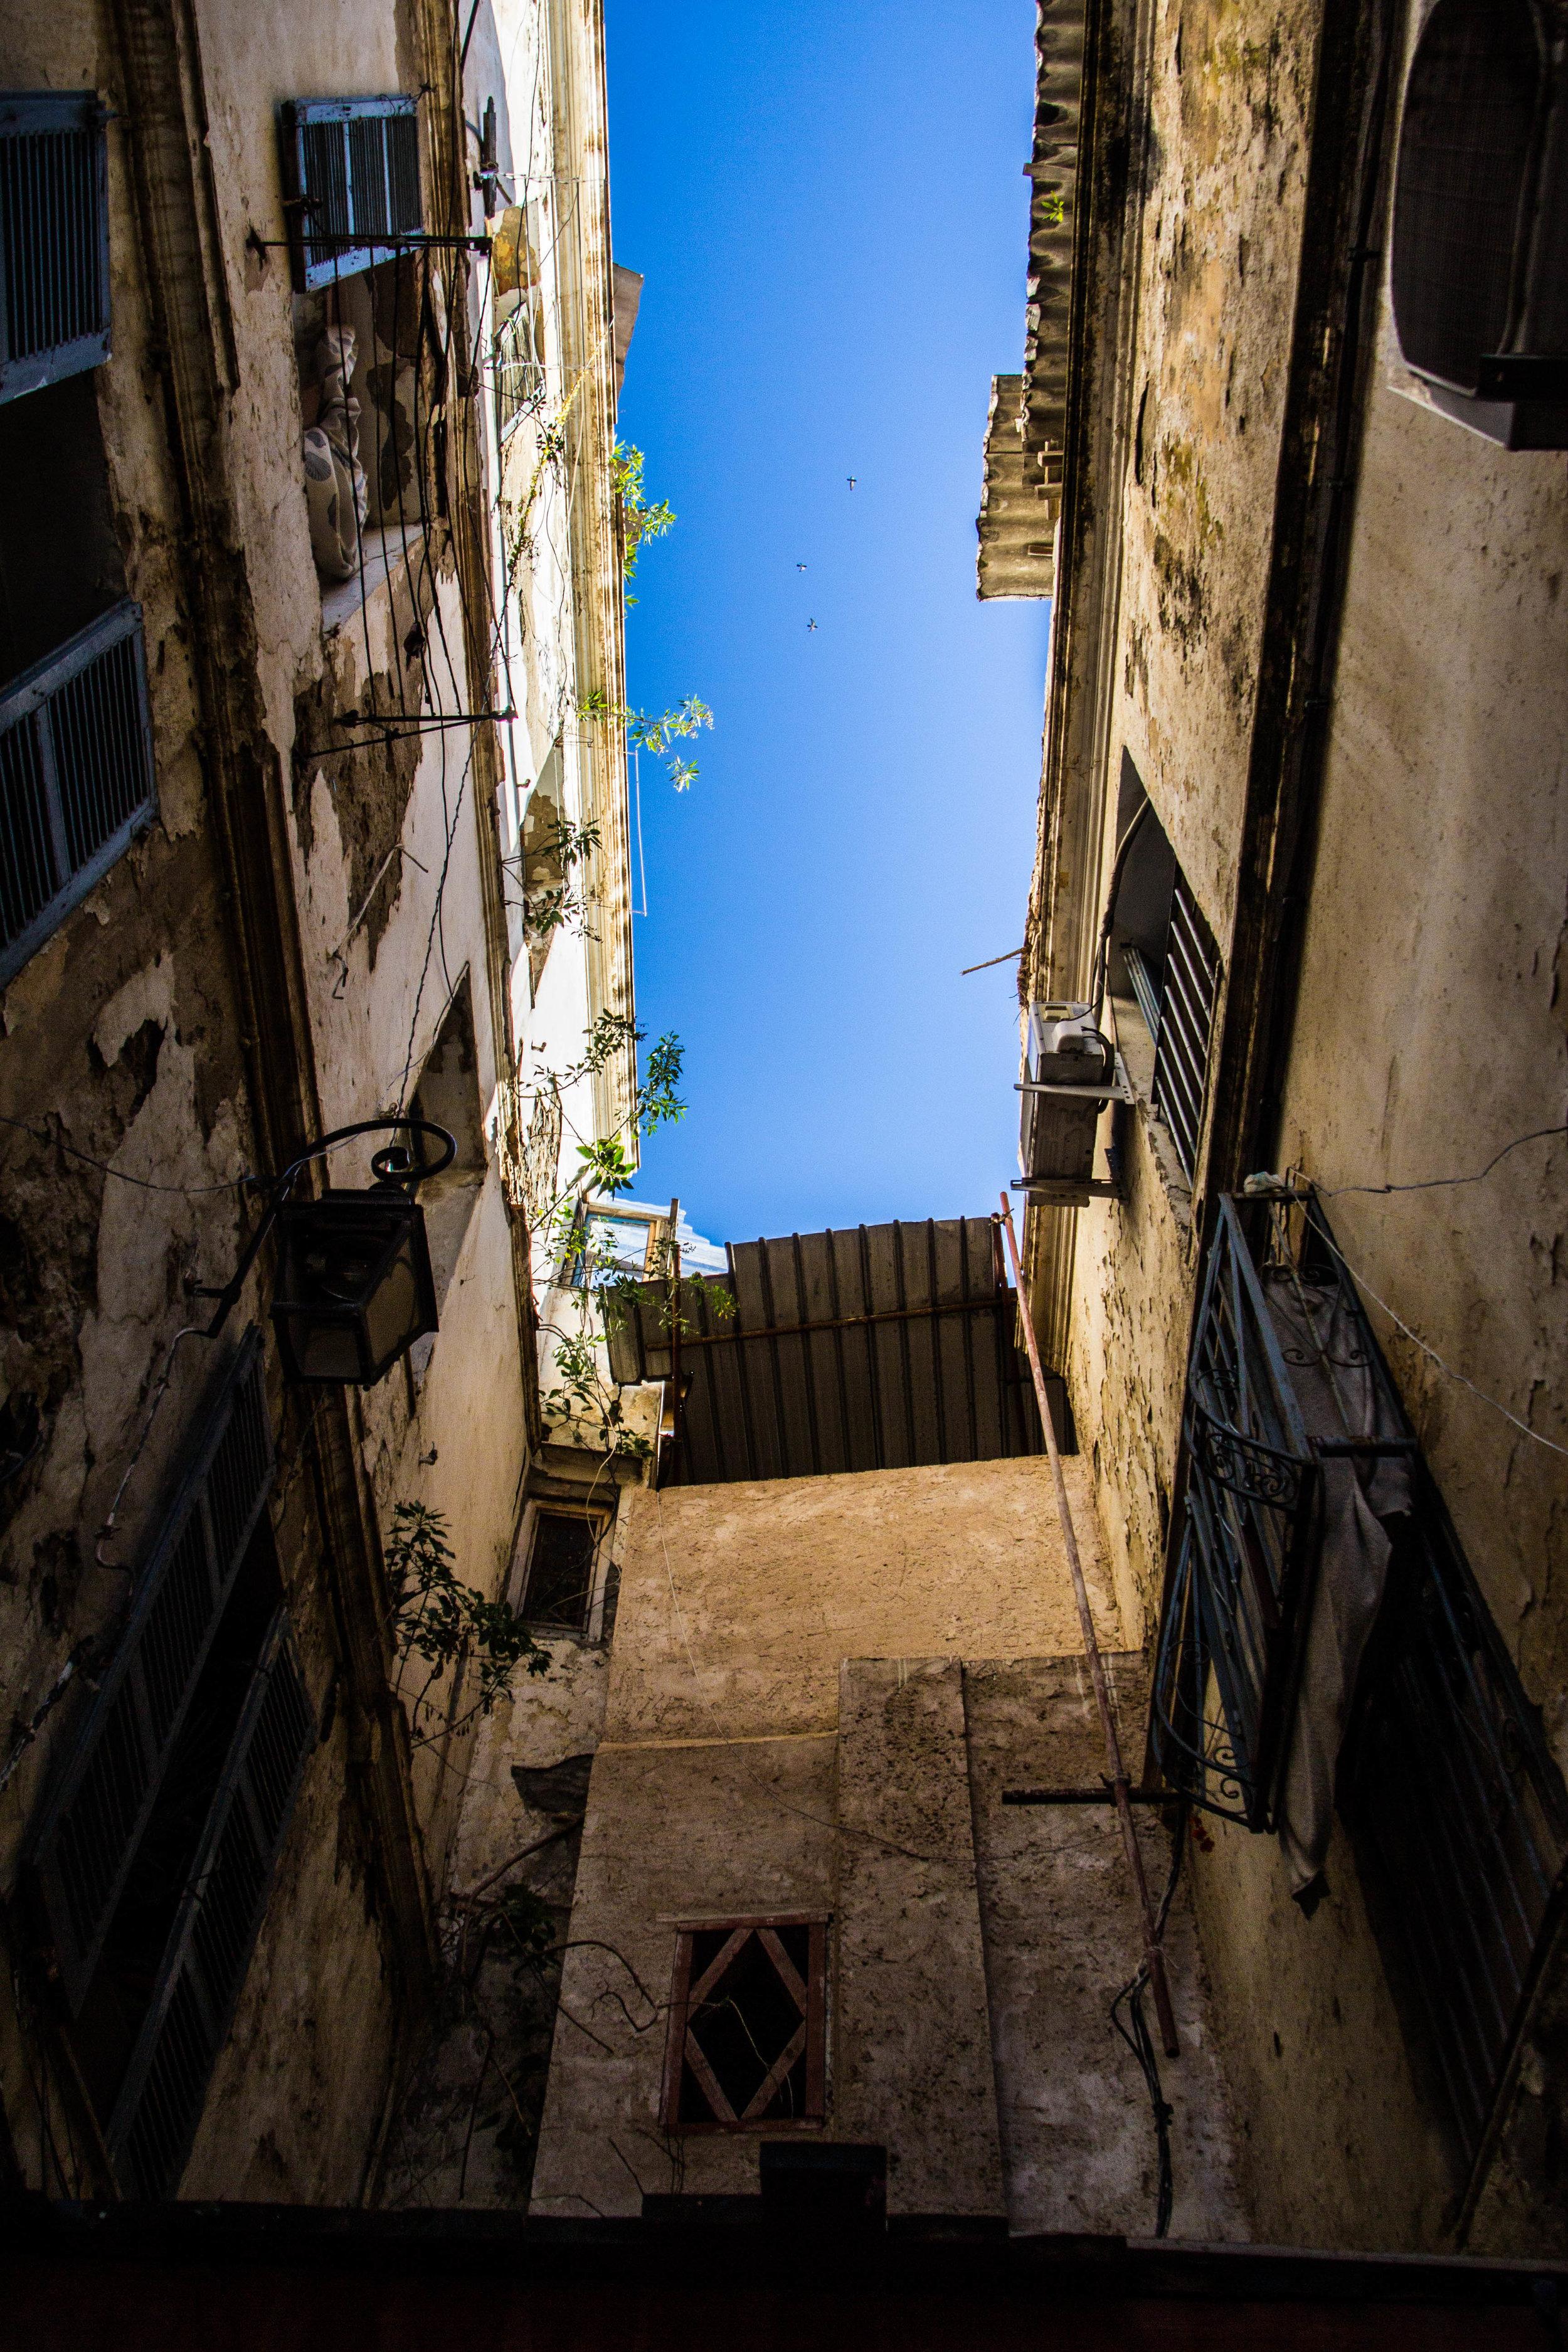 casbah-photography-algiers-algeria-alger-1.jpg